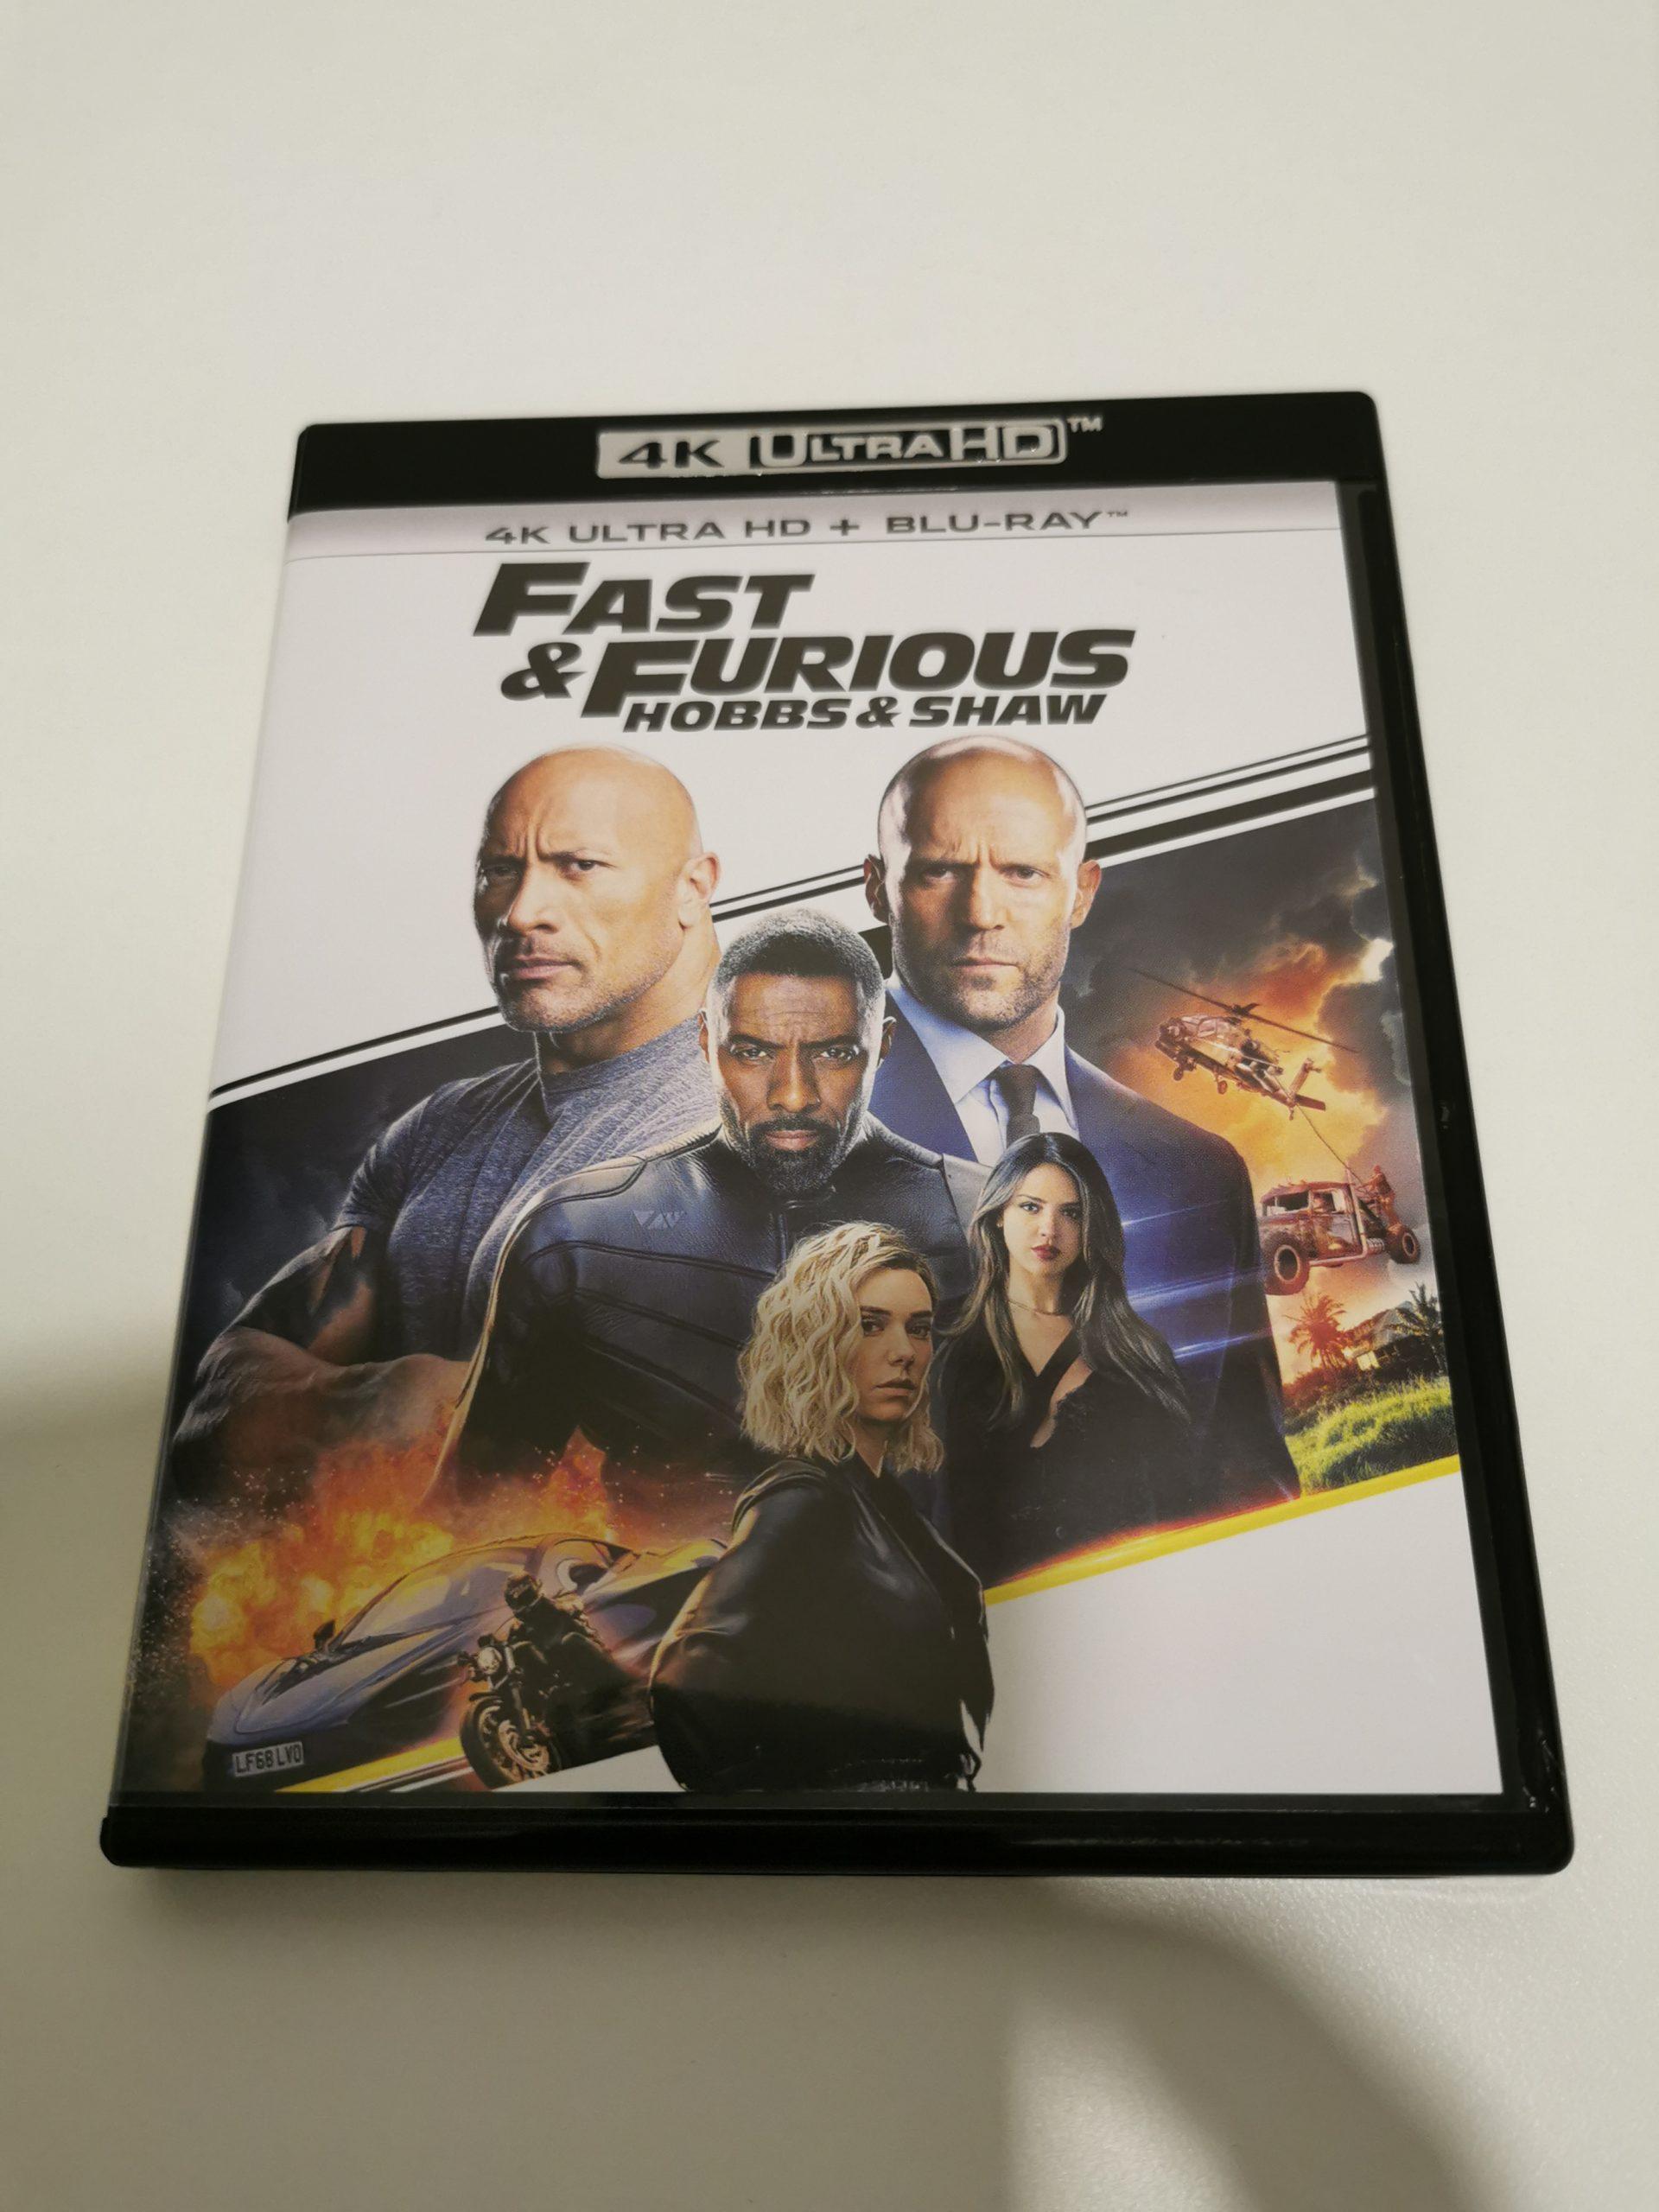 'Fast & Furious: Hobbs & Shaw 02